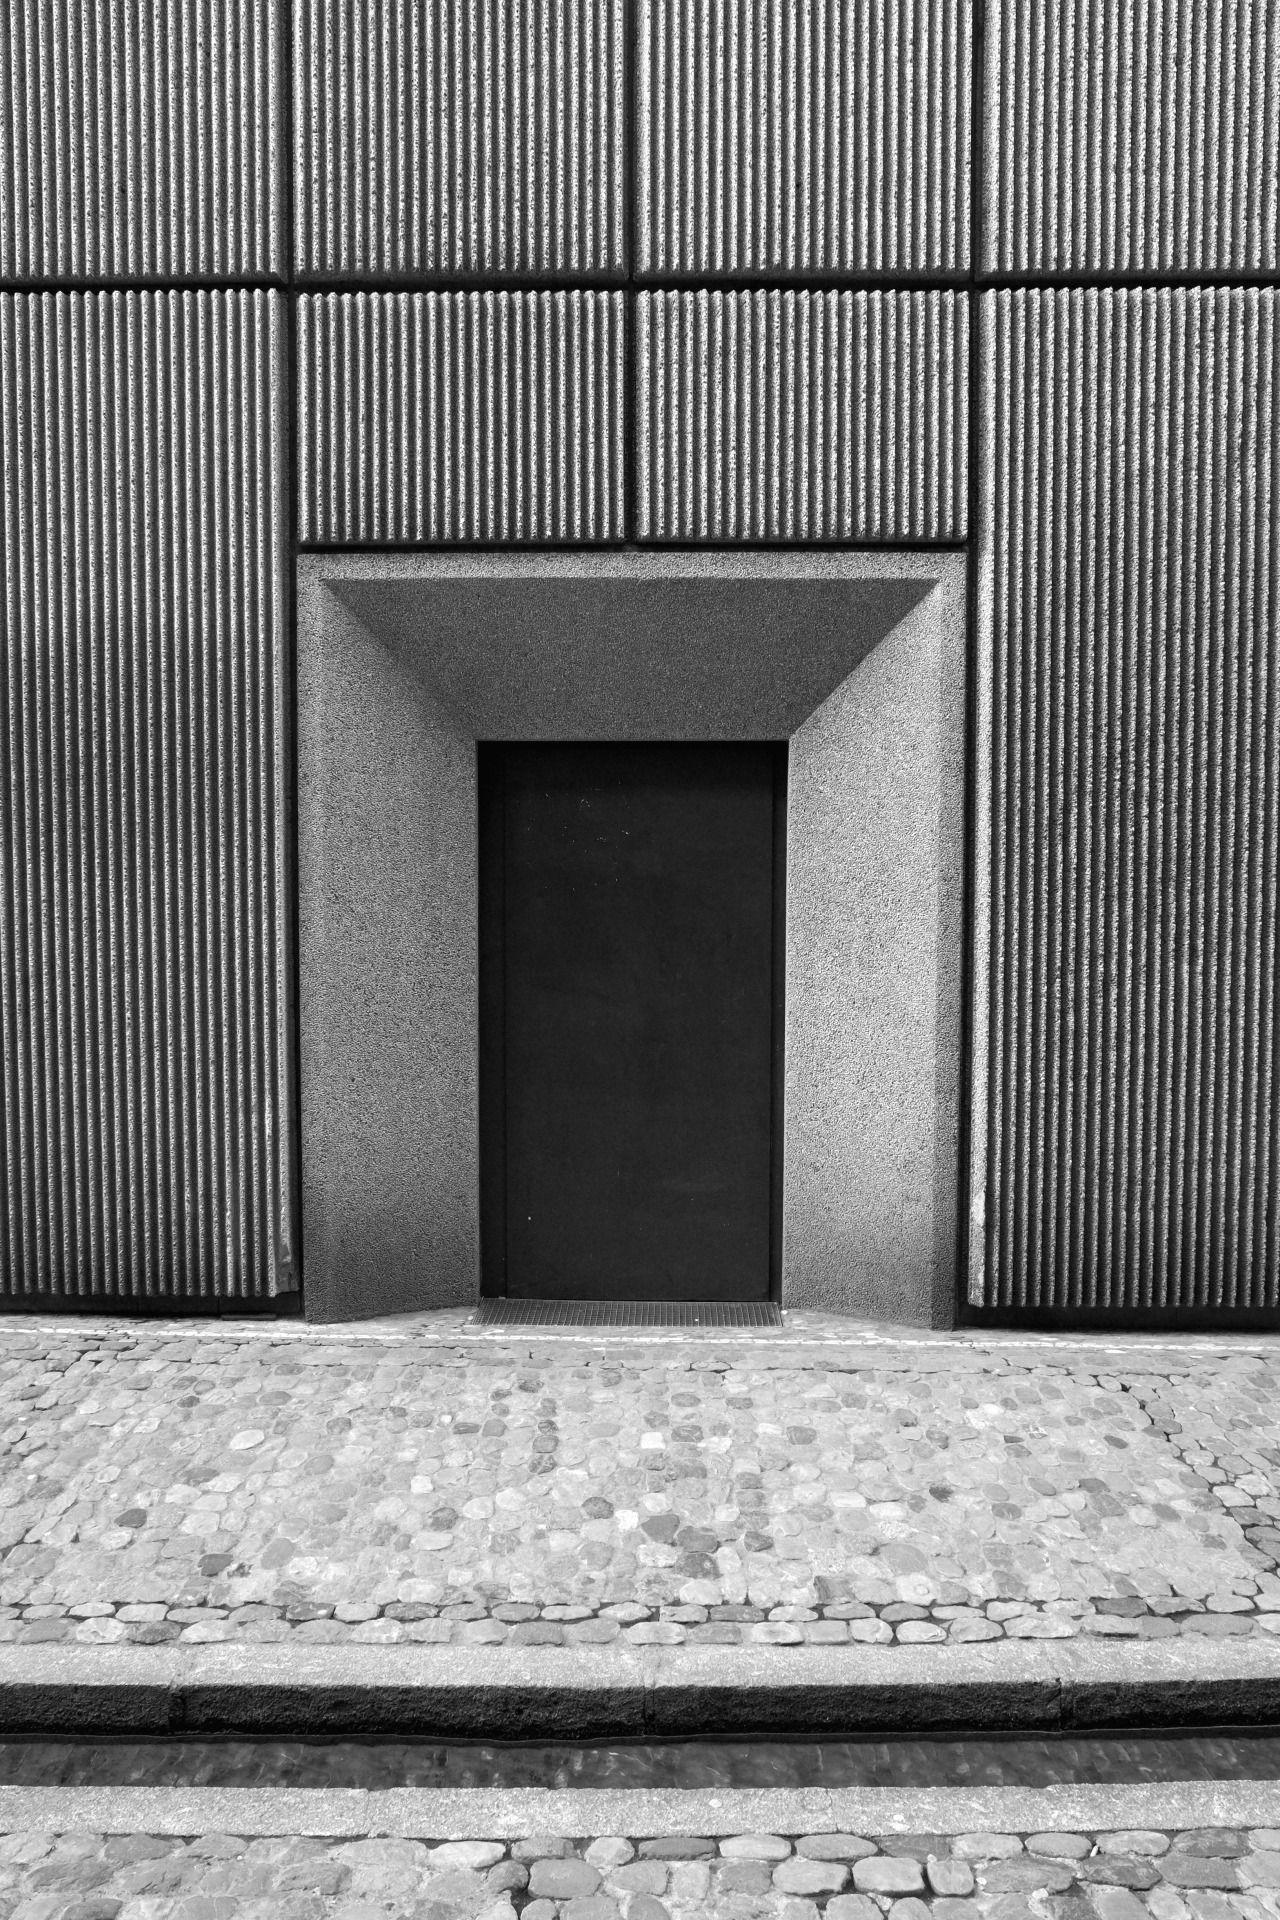 Lib5743 Minimalist Architecture Architecture Details Concrete Architecture